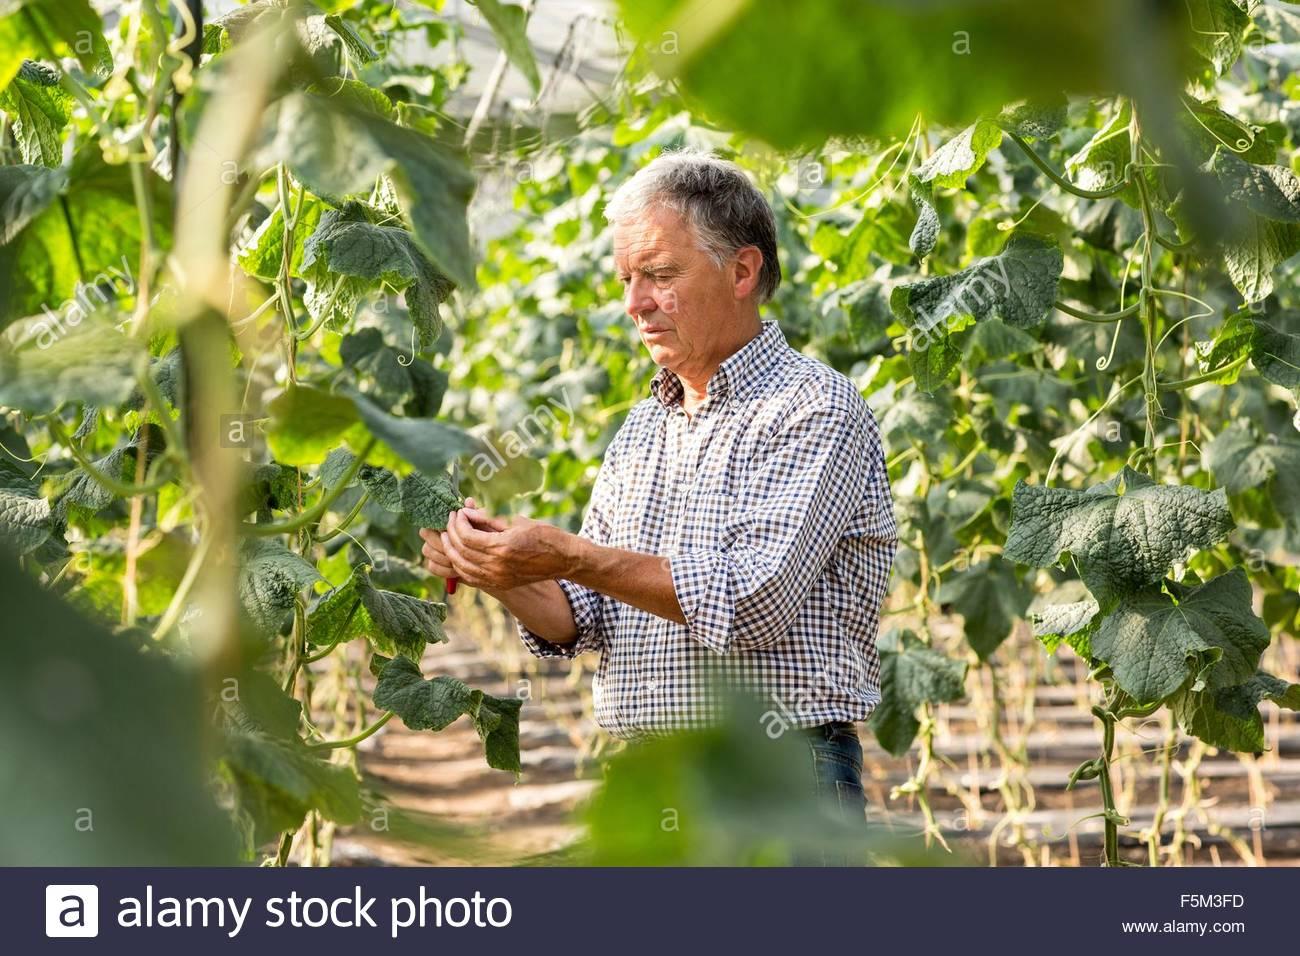 Senior man tending to cucumber plants looking down - Stock Image